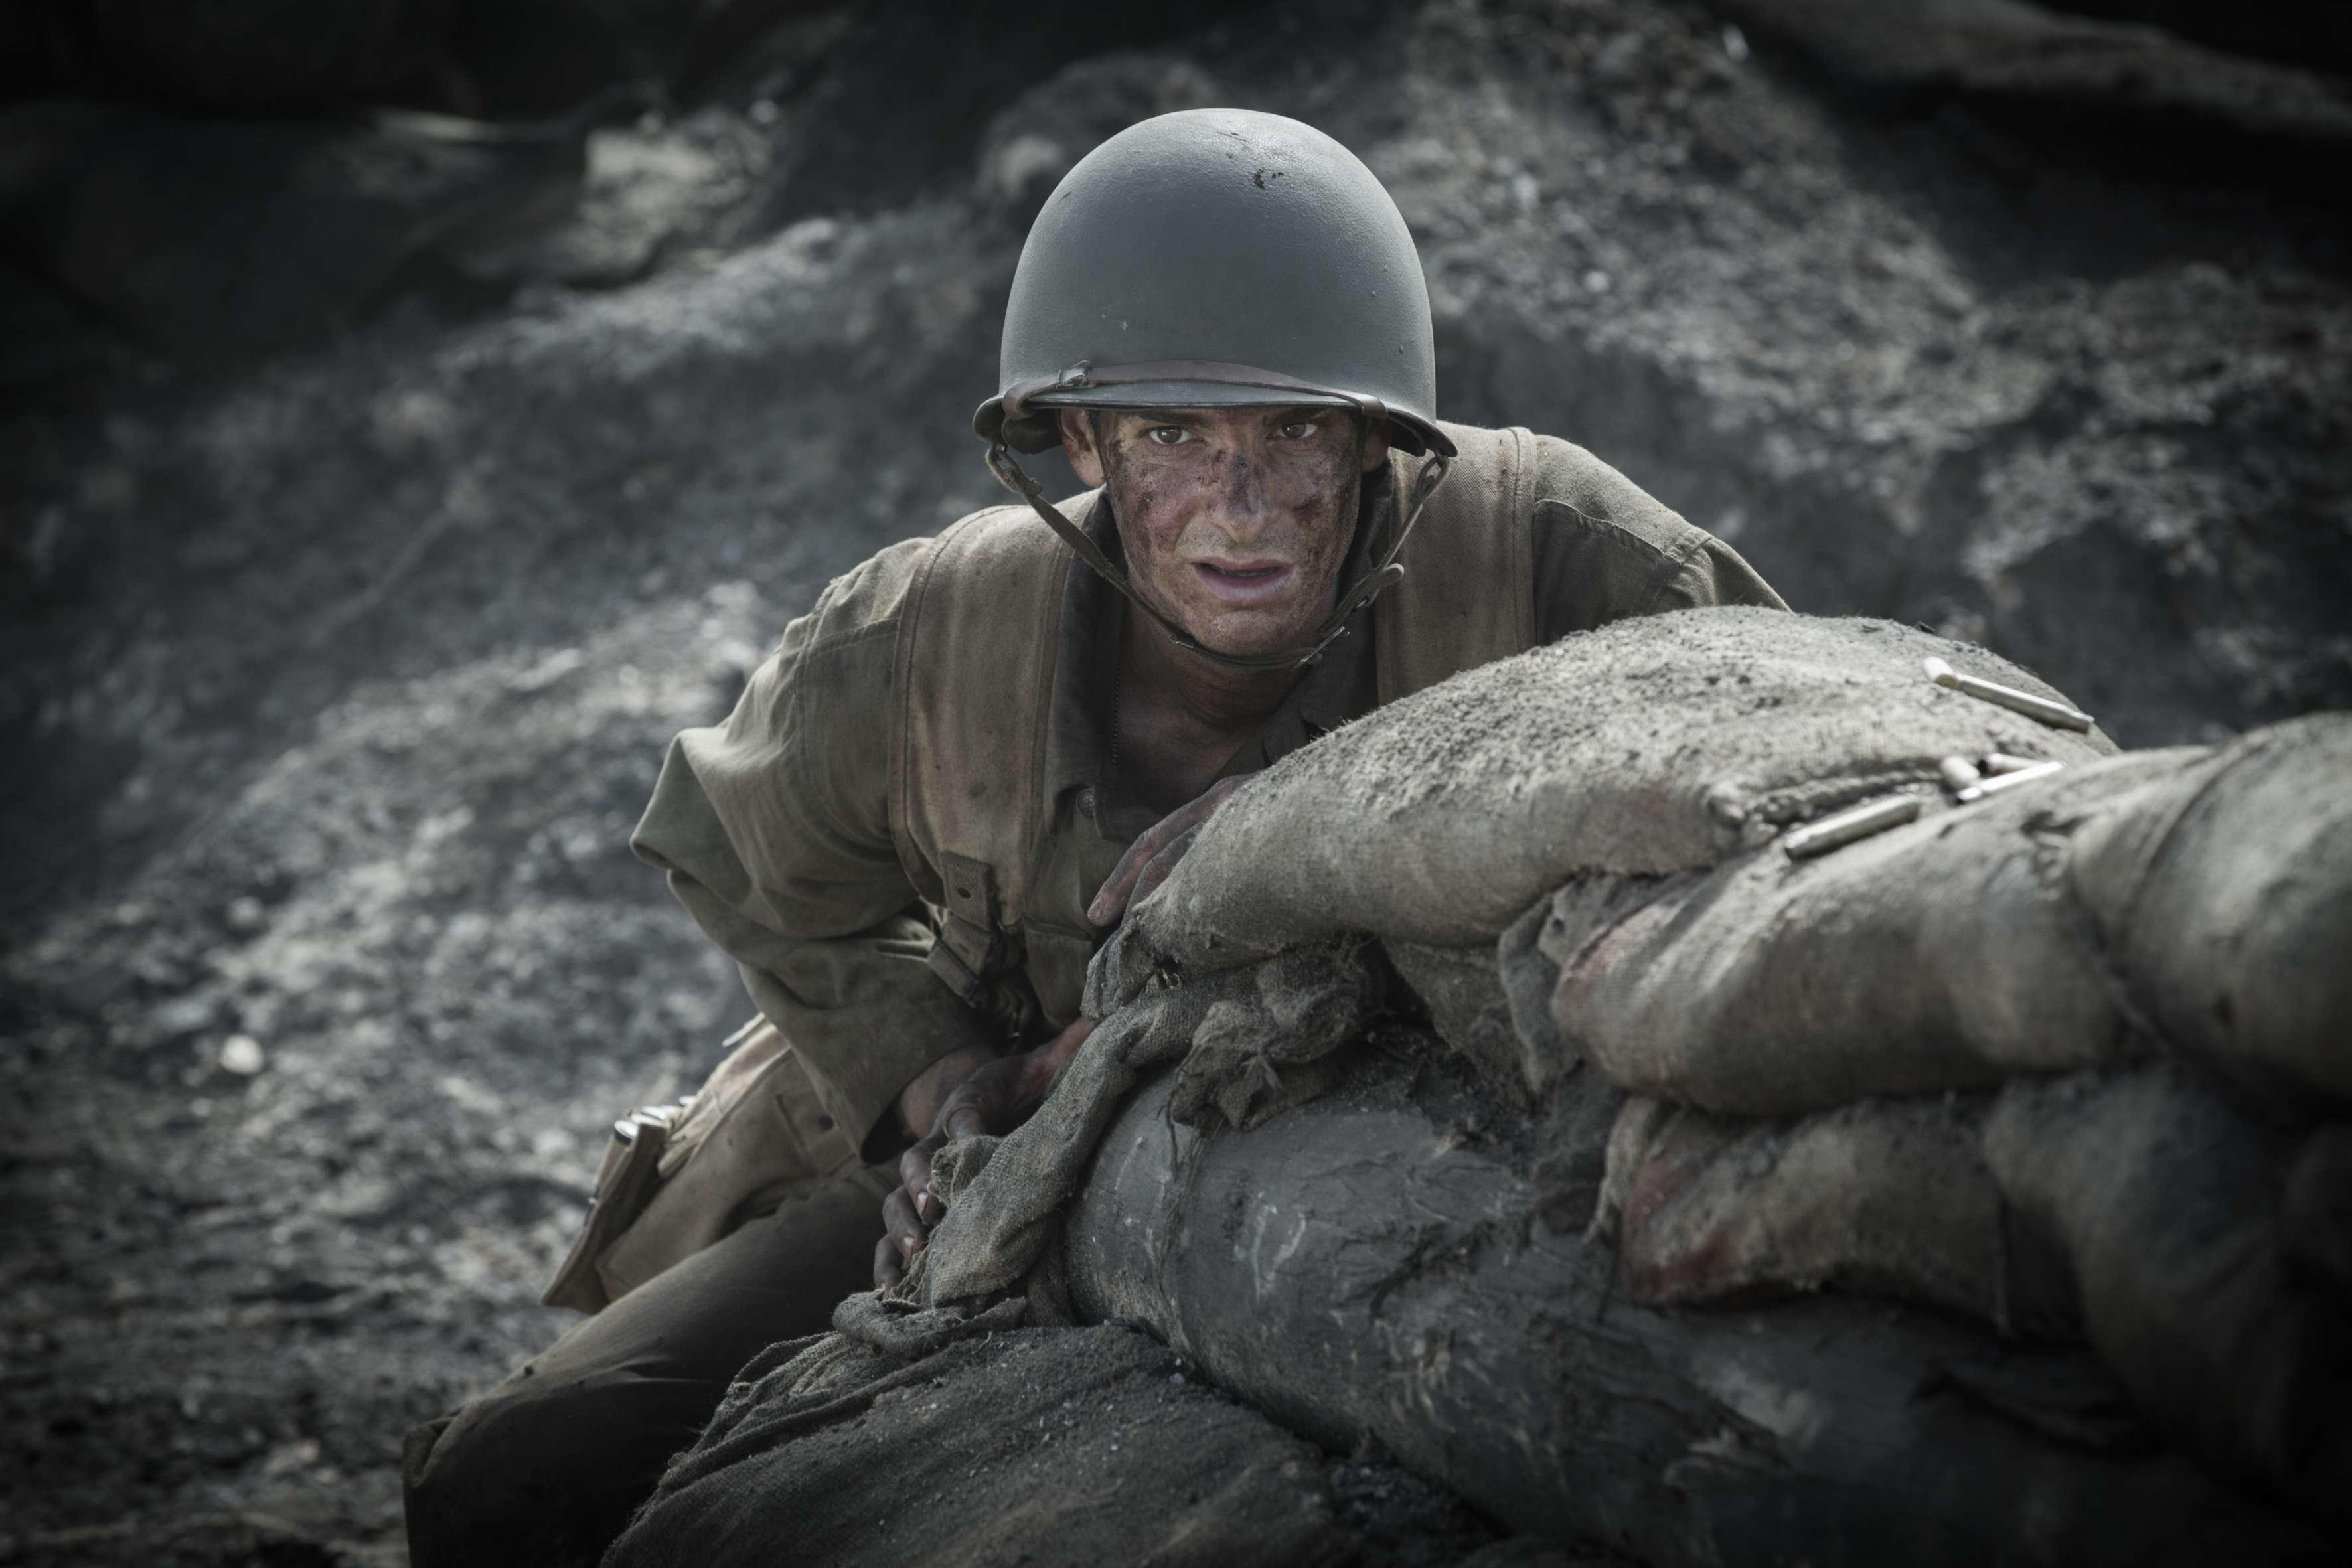 Film Review Hacksaw Ridge Mel Gibson S Triumphant Return In Gory War Drama South China Morning Post